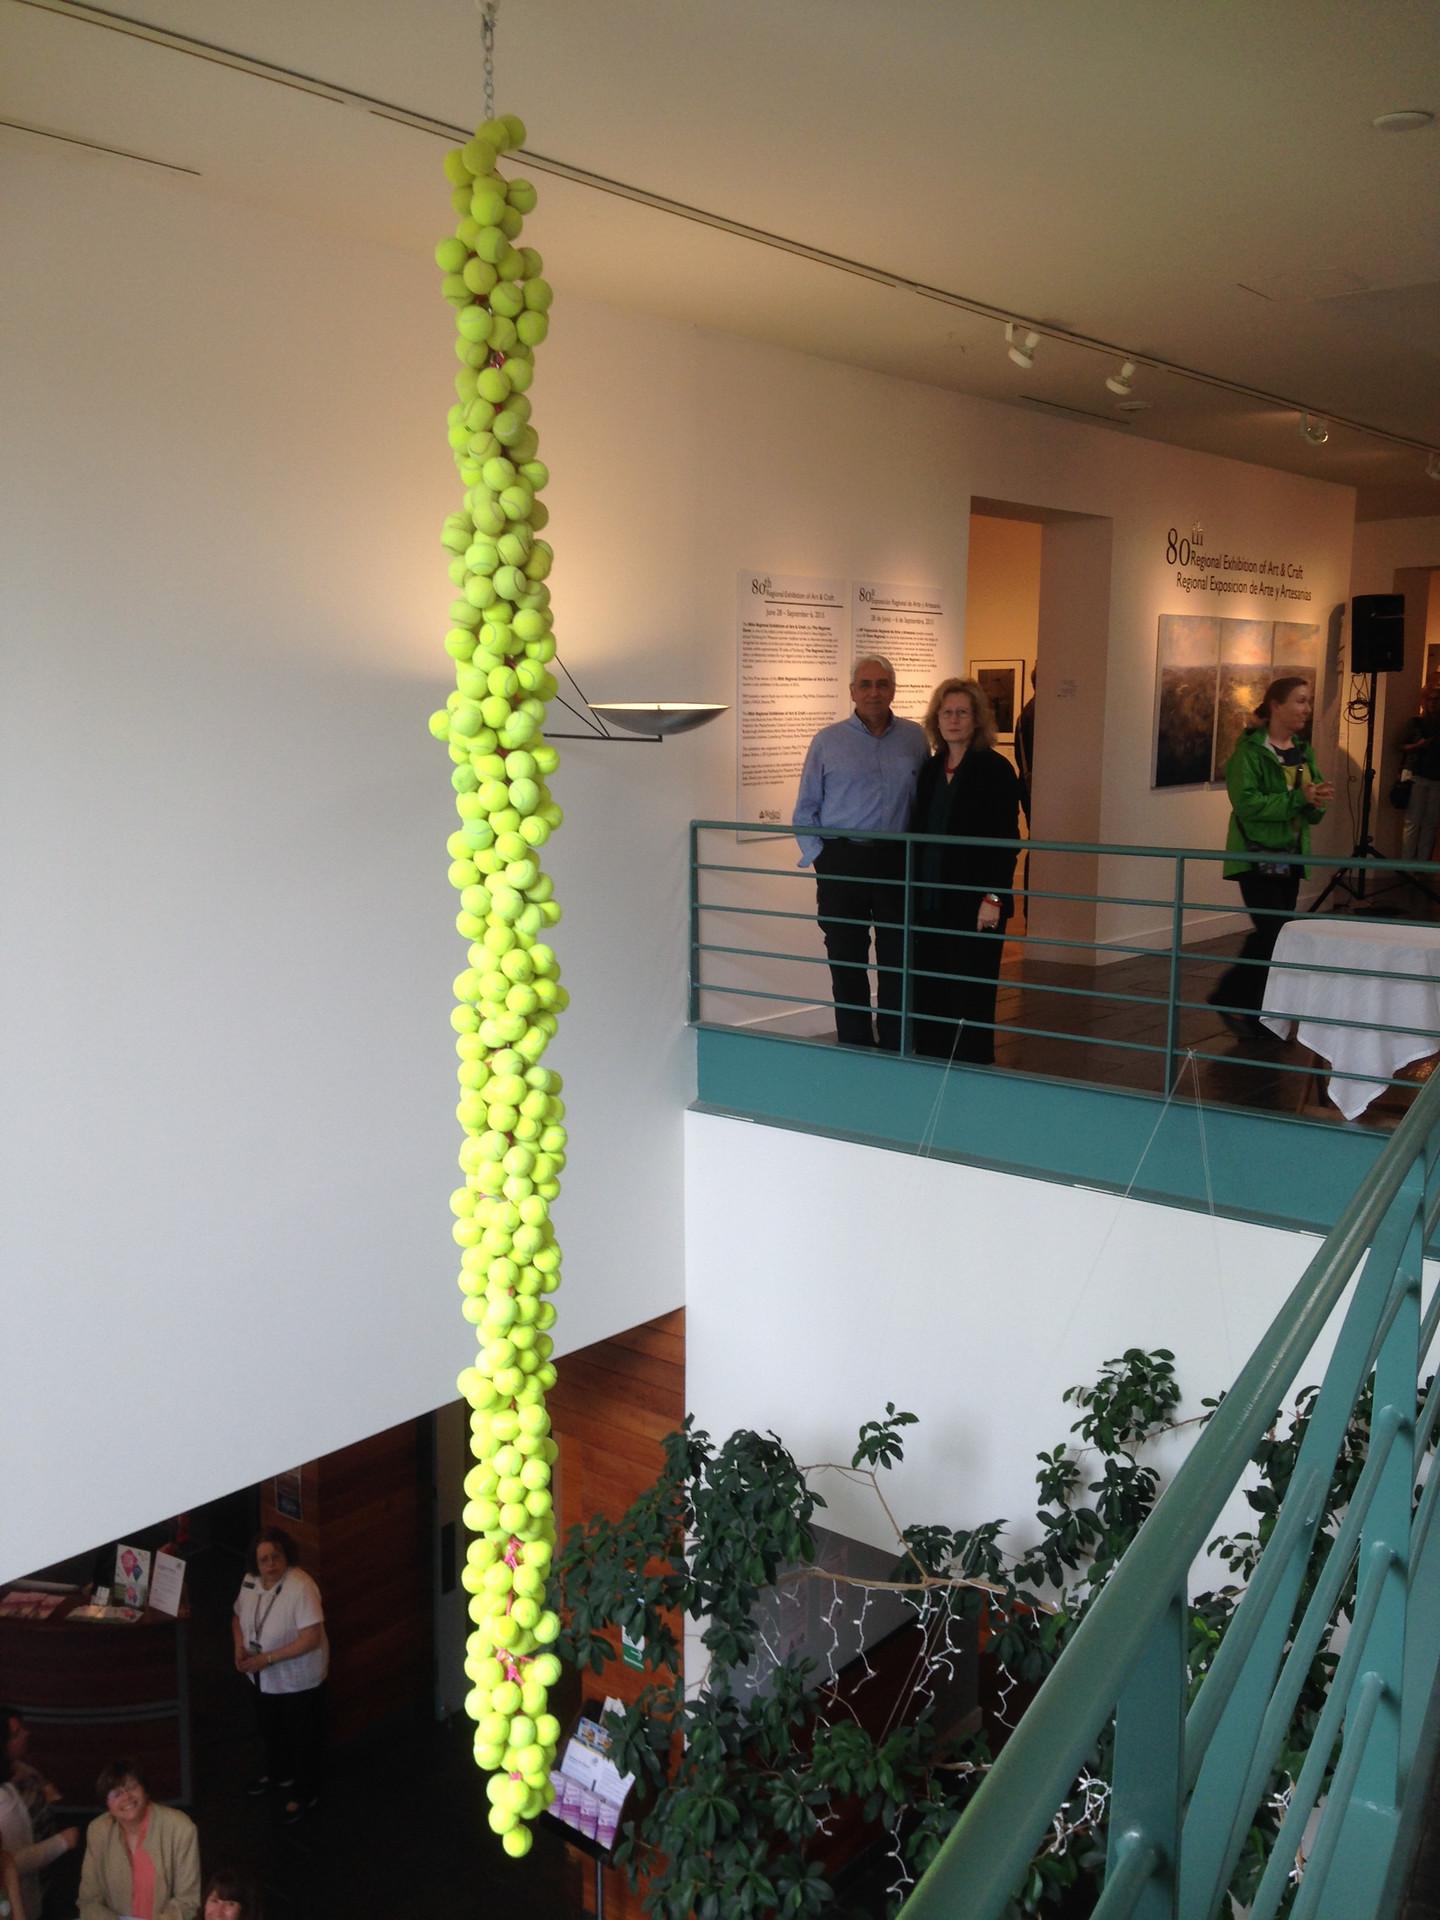 2015  Fitchburg Art Museum Fitchburg, Massachusetts 2015